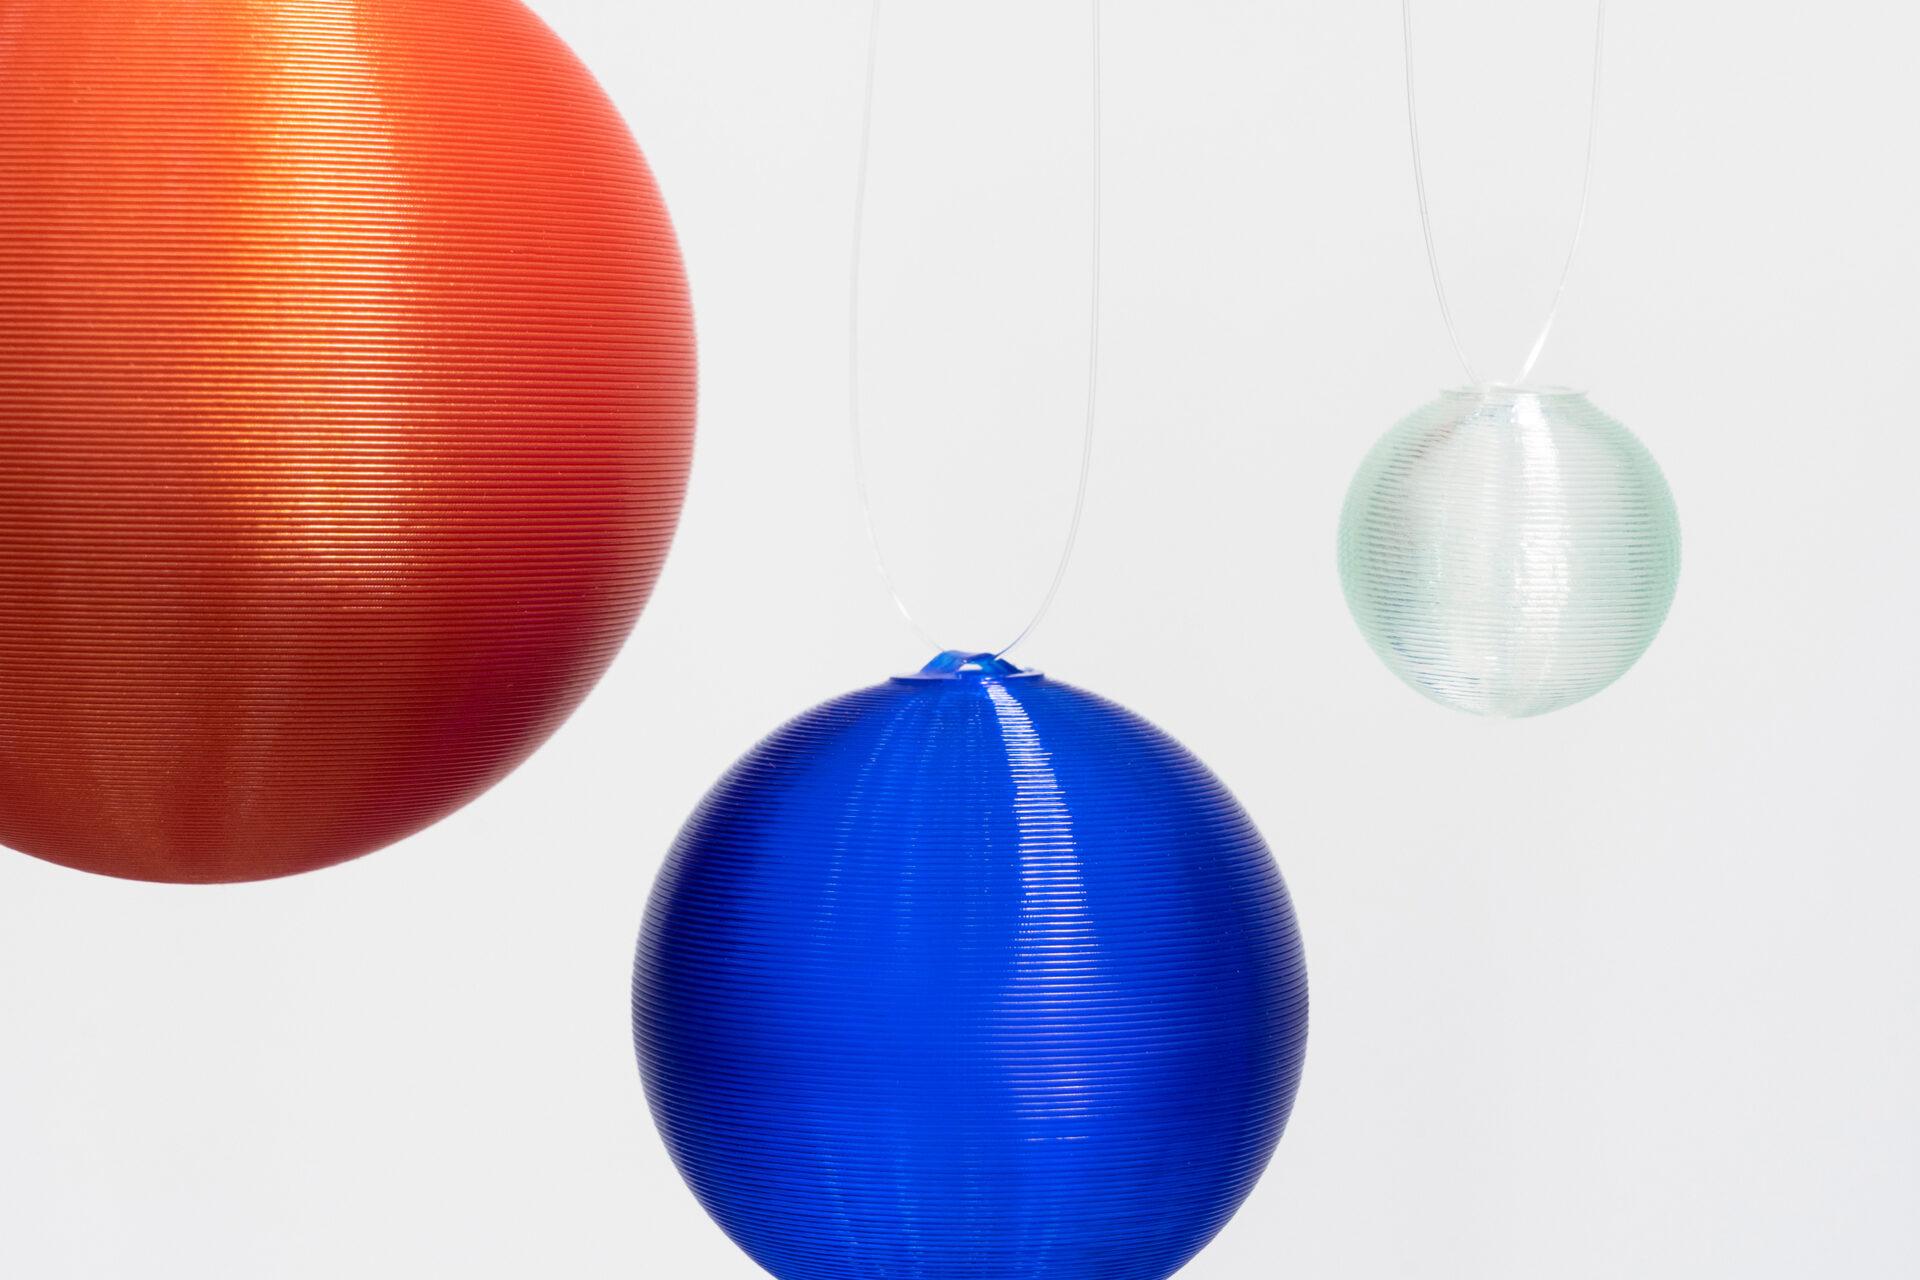 helix globes